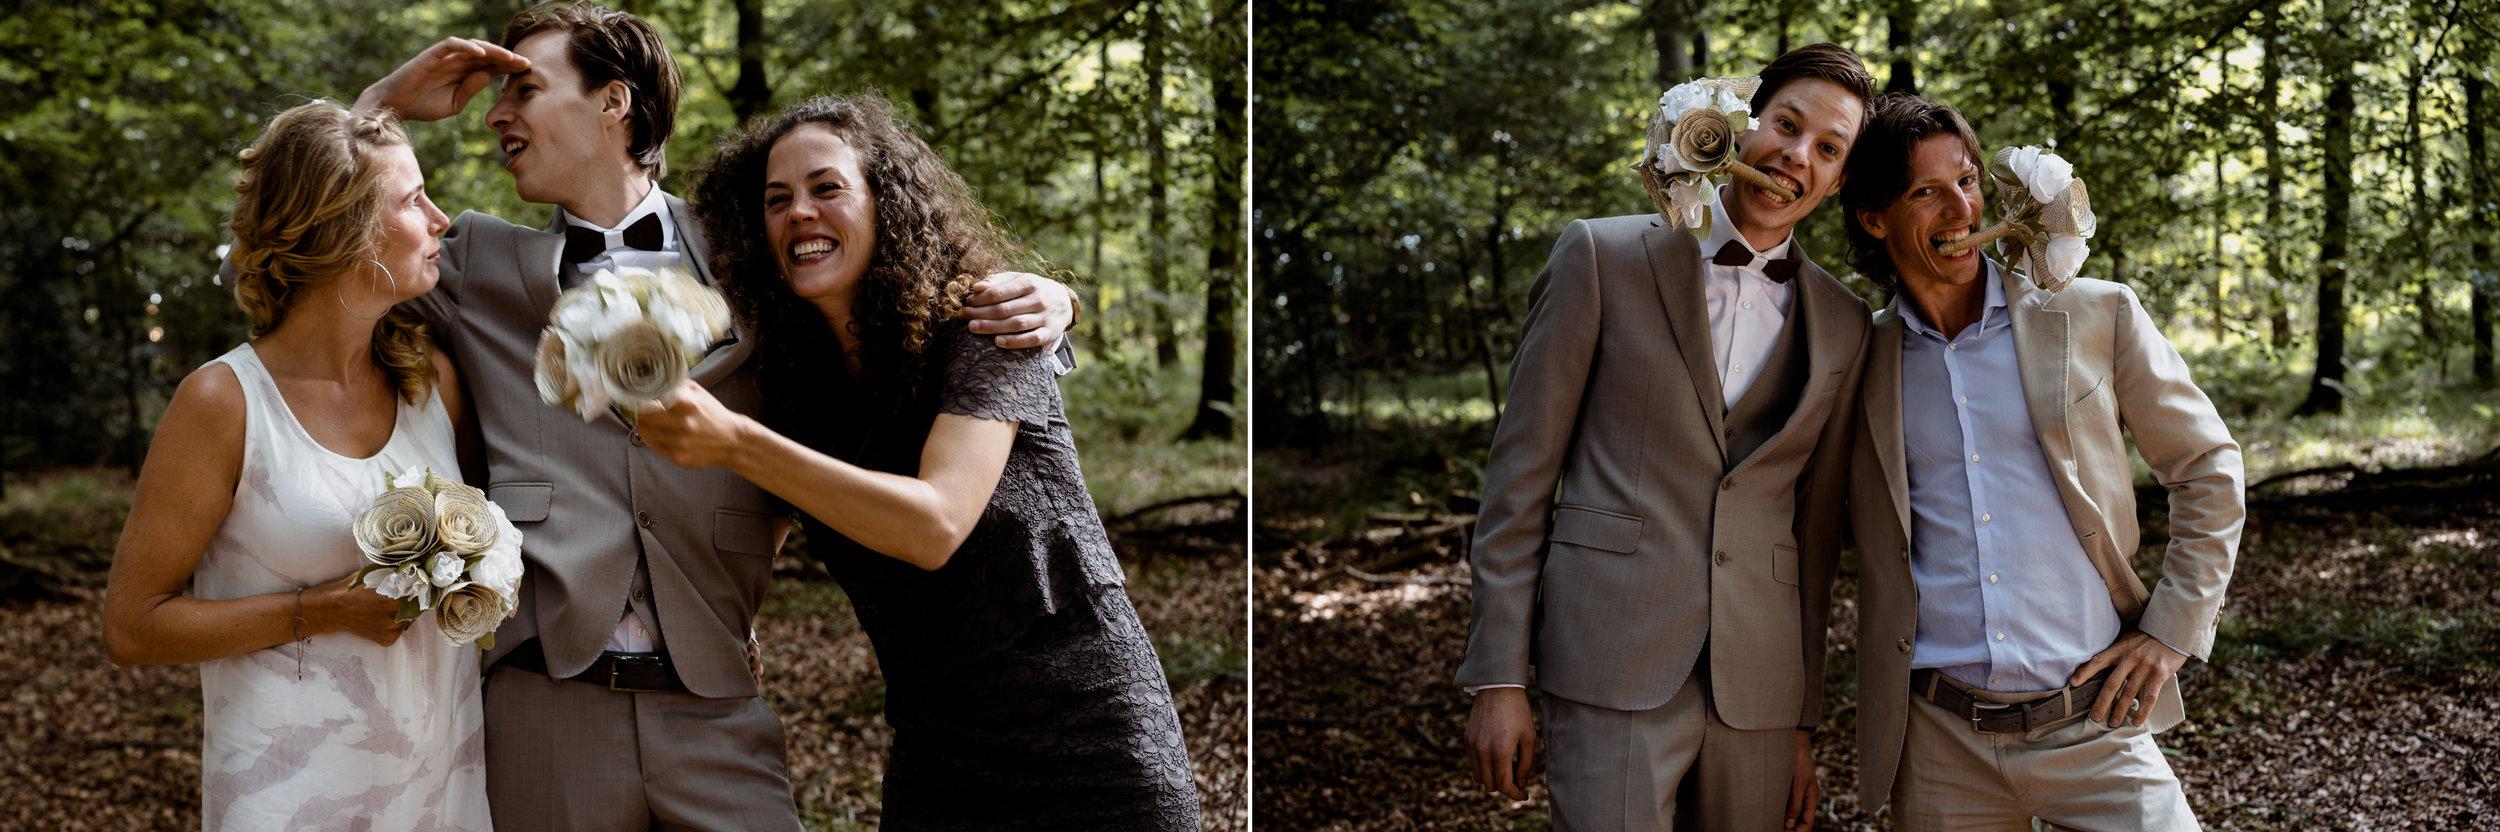 amsterdam-wedding-photographer-bruidsfotografie-trouwfotograaf-mark-hadden-Lucie-Luuk-191 copy.jpg